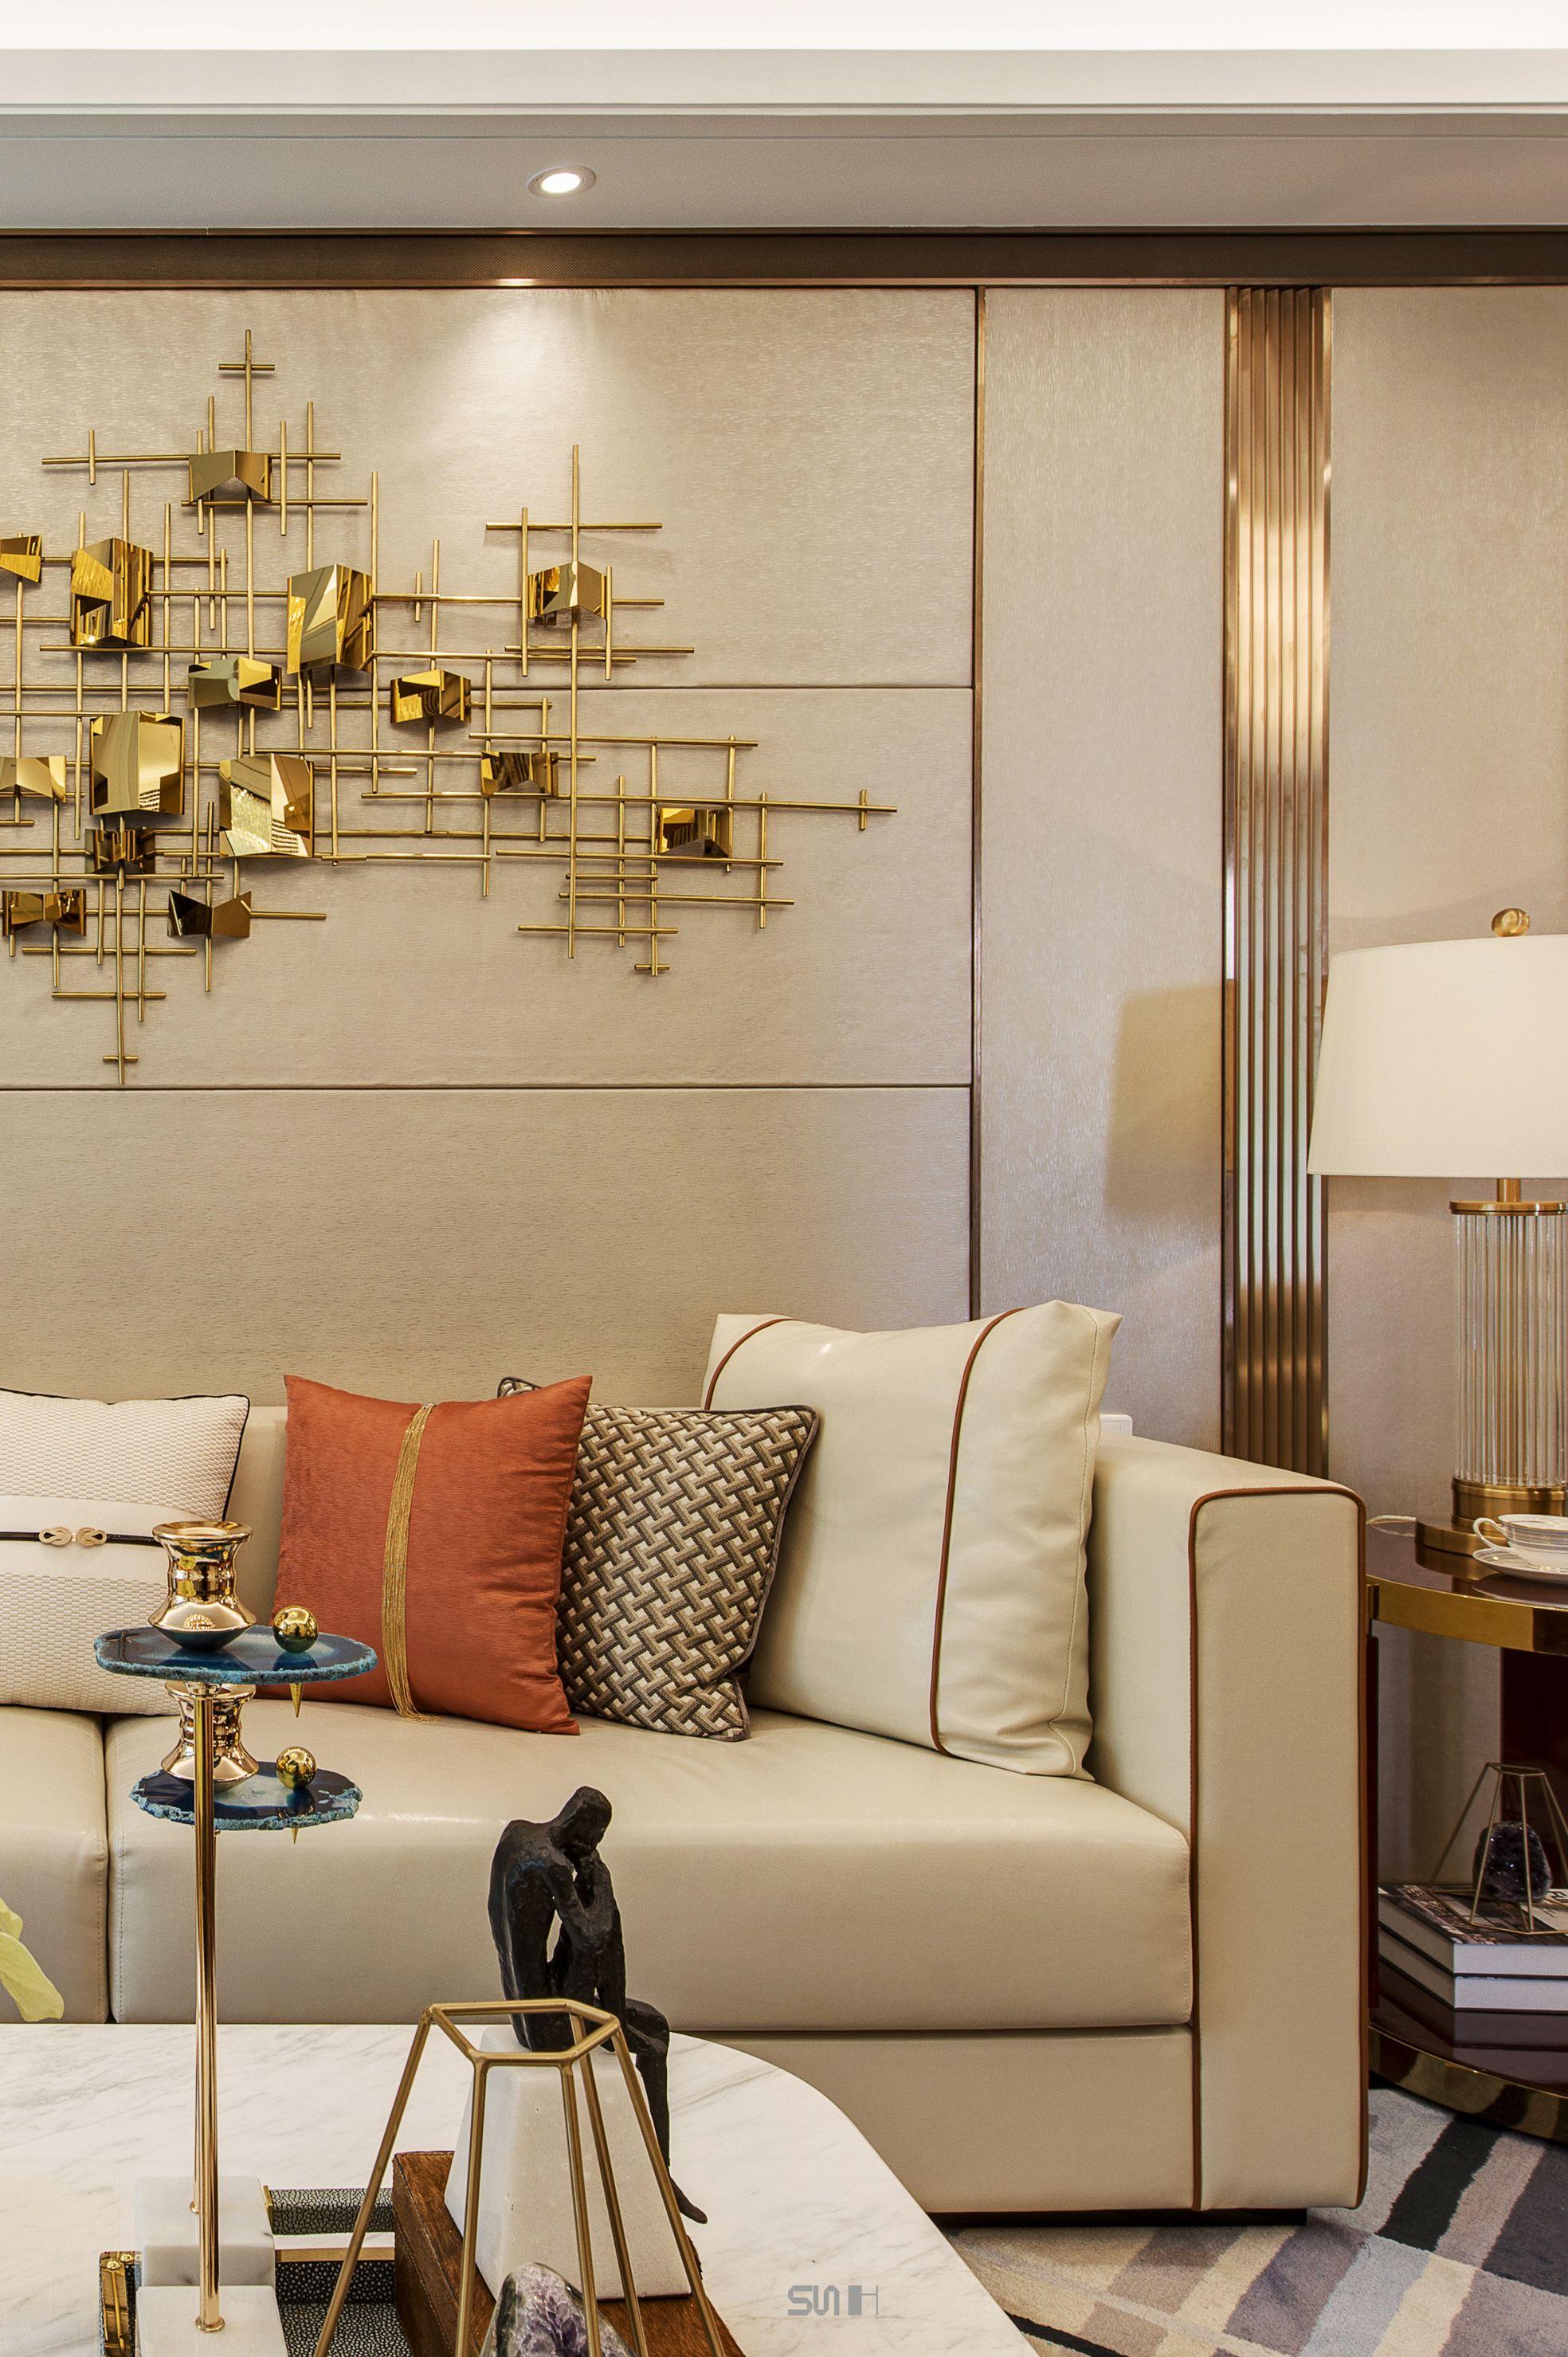 17 Remarkable Mid-century Modern Bedroom Designs | Design ...